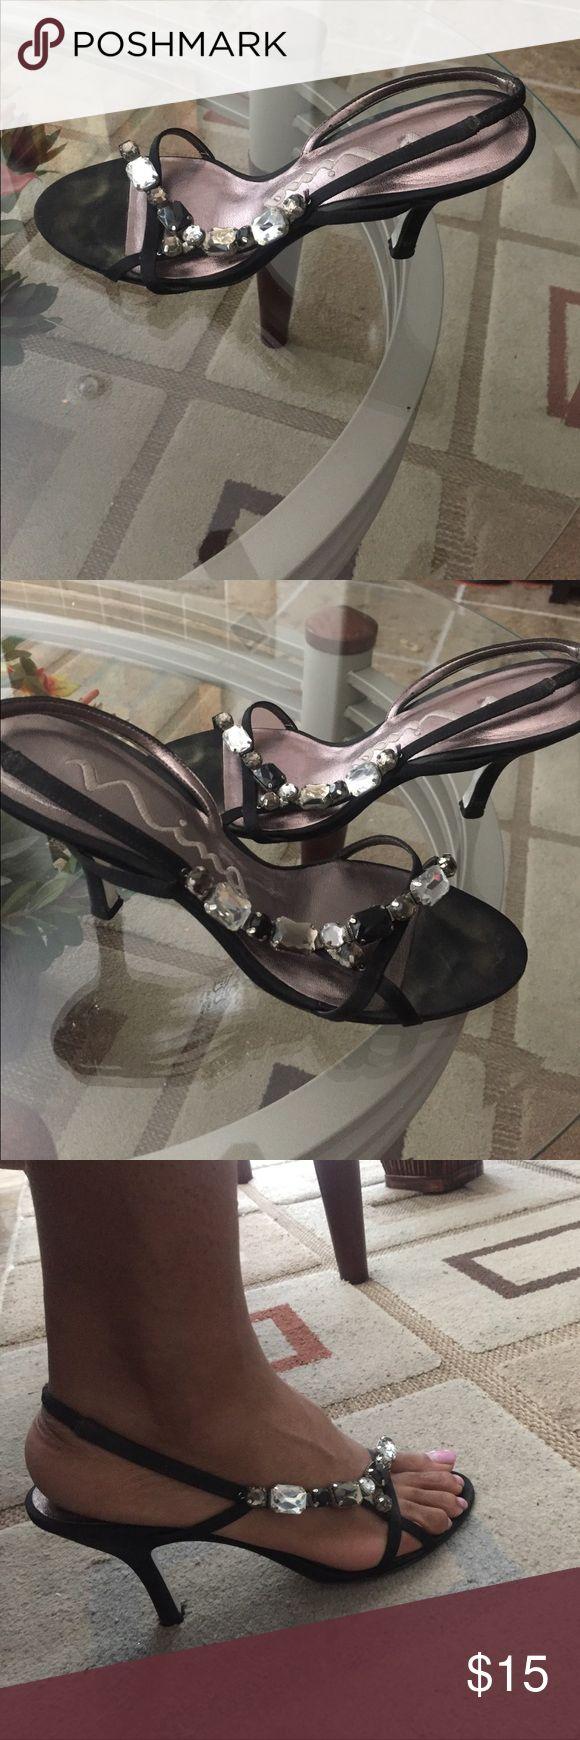 Nina Dressy After 5 Heels. Dressy heels for cocktail or formal attire. Super comfortable. Jewel detail. 3.5inch heel. Size 8 US. Nina Shoes Heels